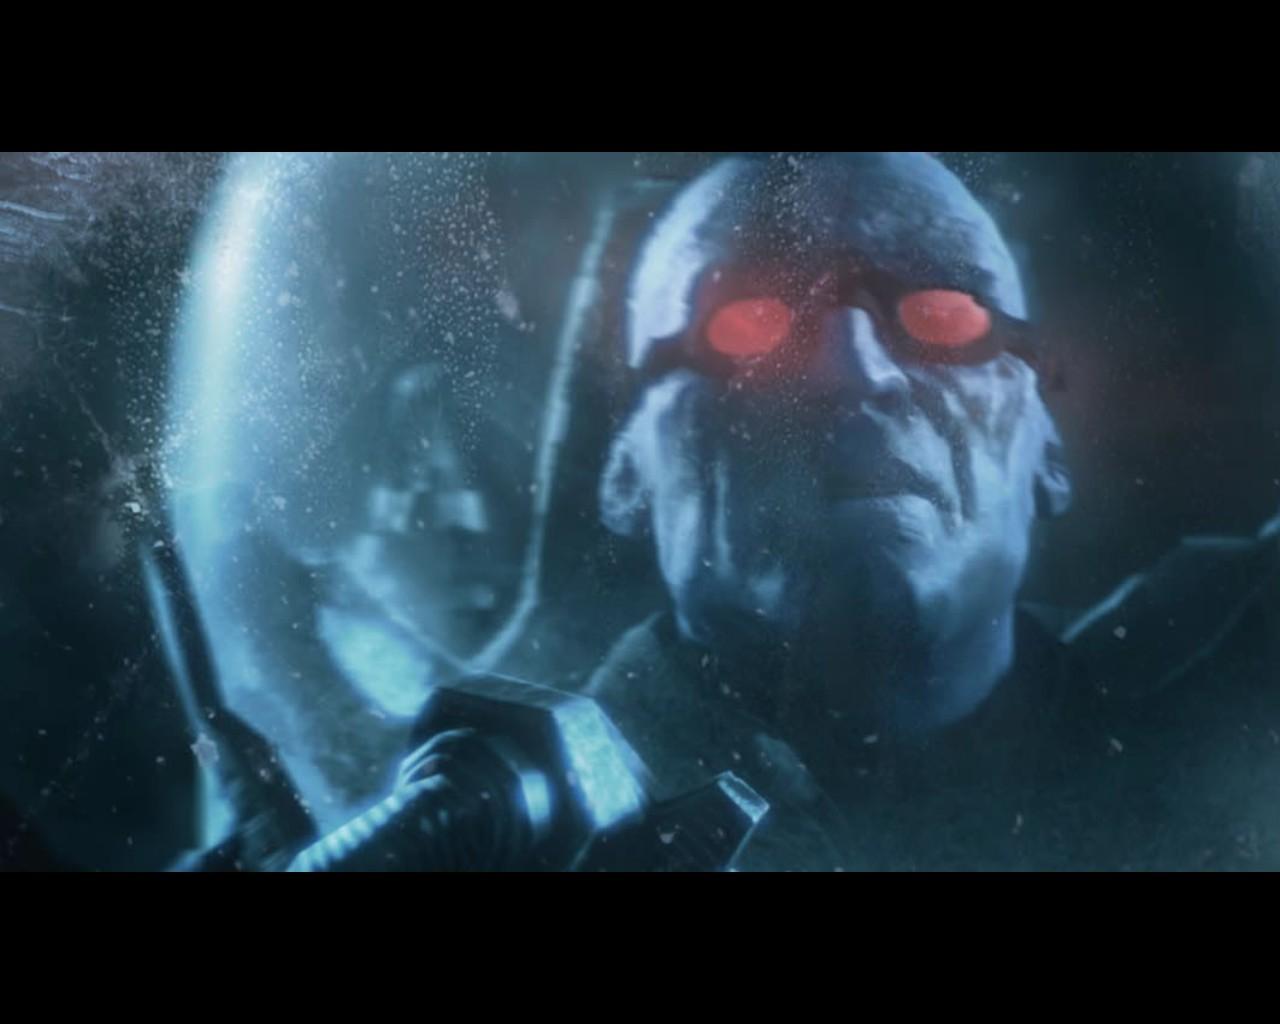 BatmanOrigins 2014-07-09 22-48-59-96.jpg - Batman: Arkham Origins